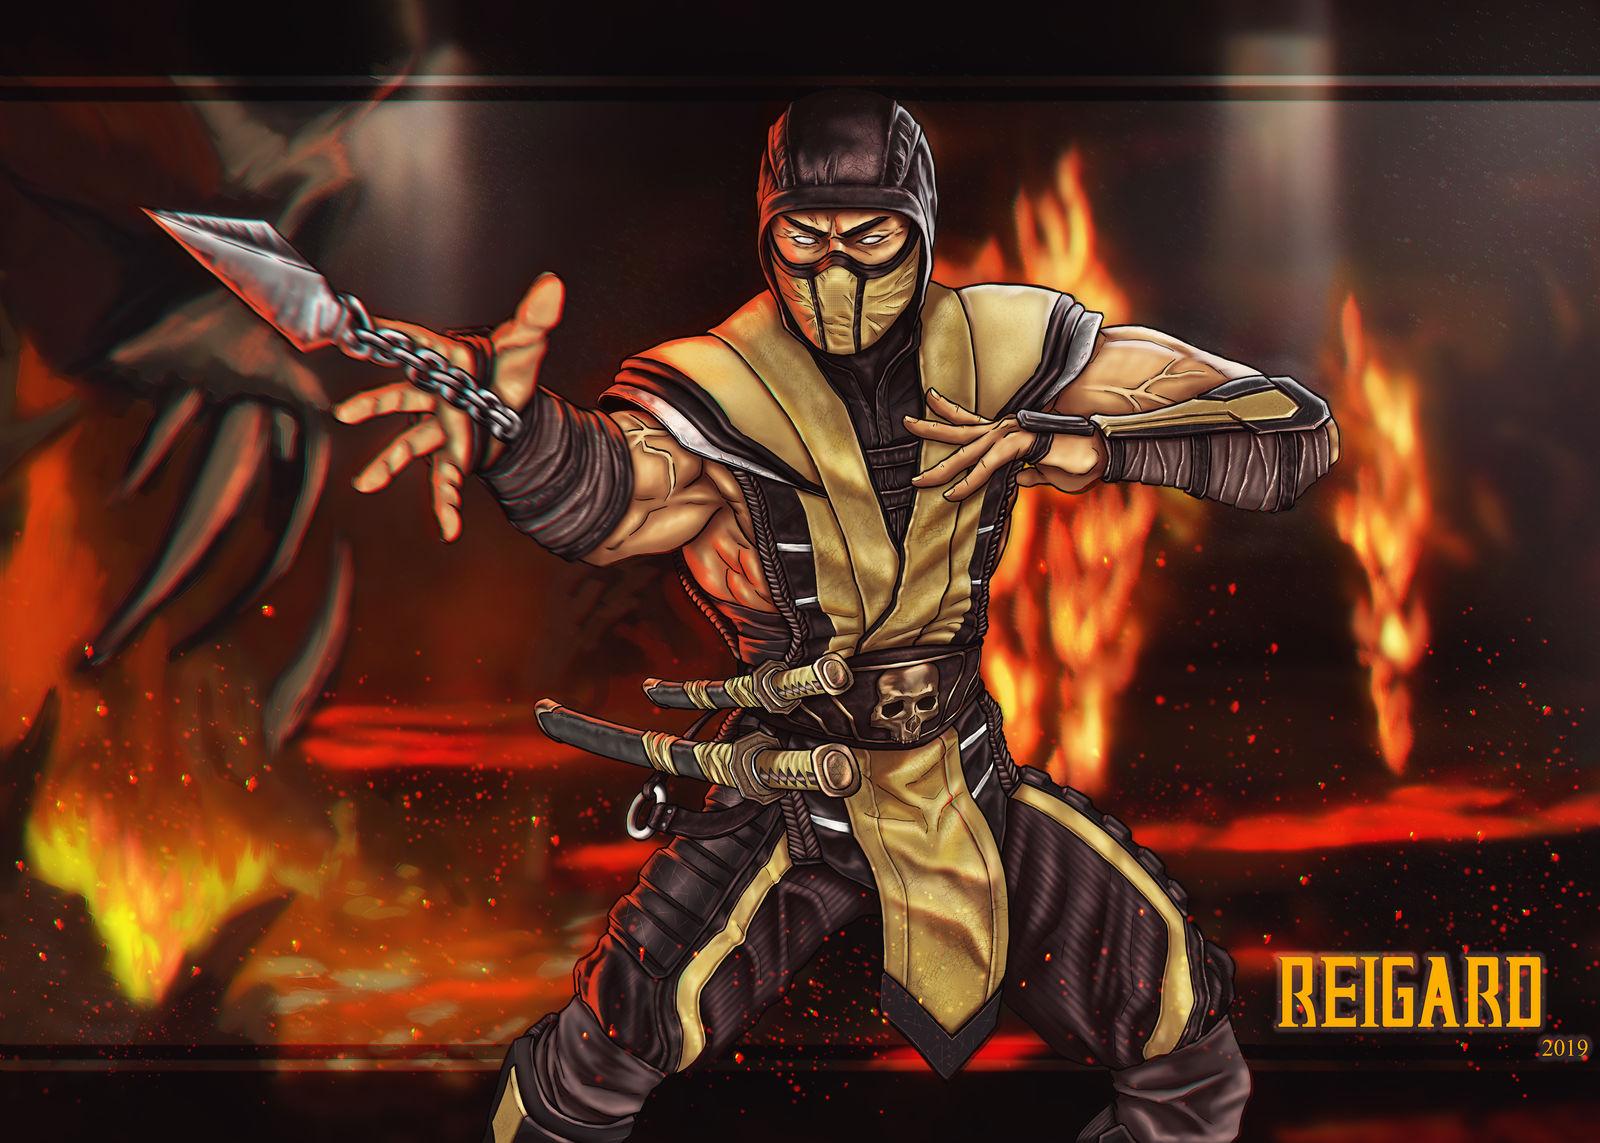 Scorpion Mortal Kombat 11 By Reigard88 On Deviantart